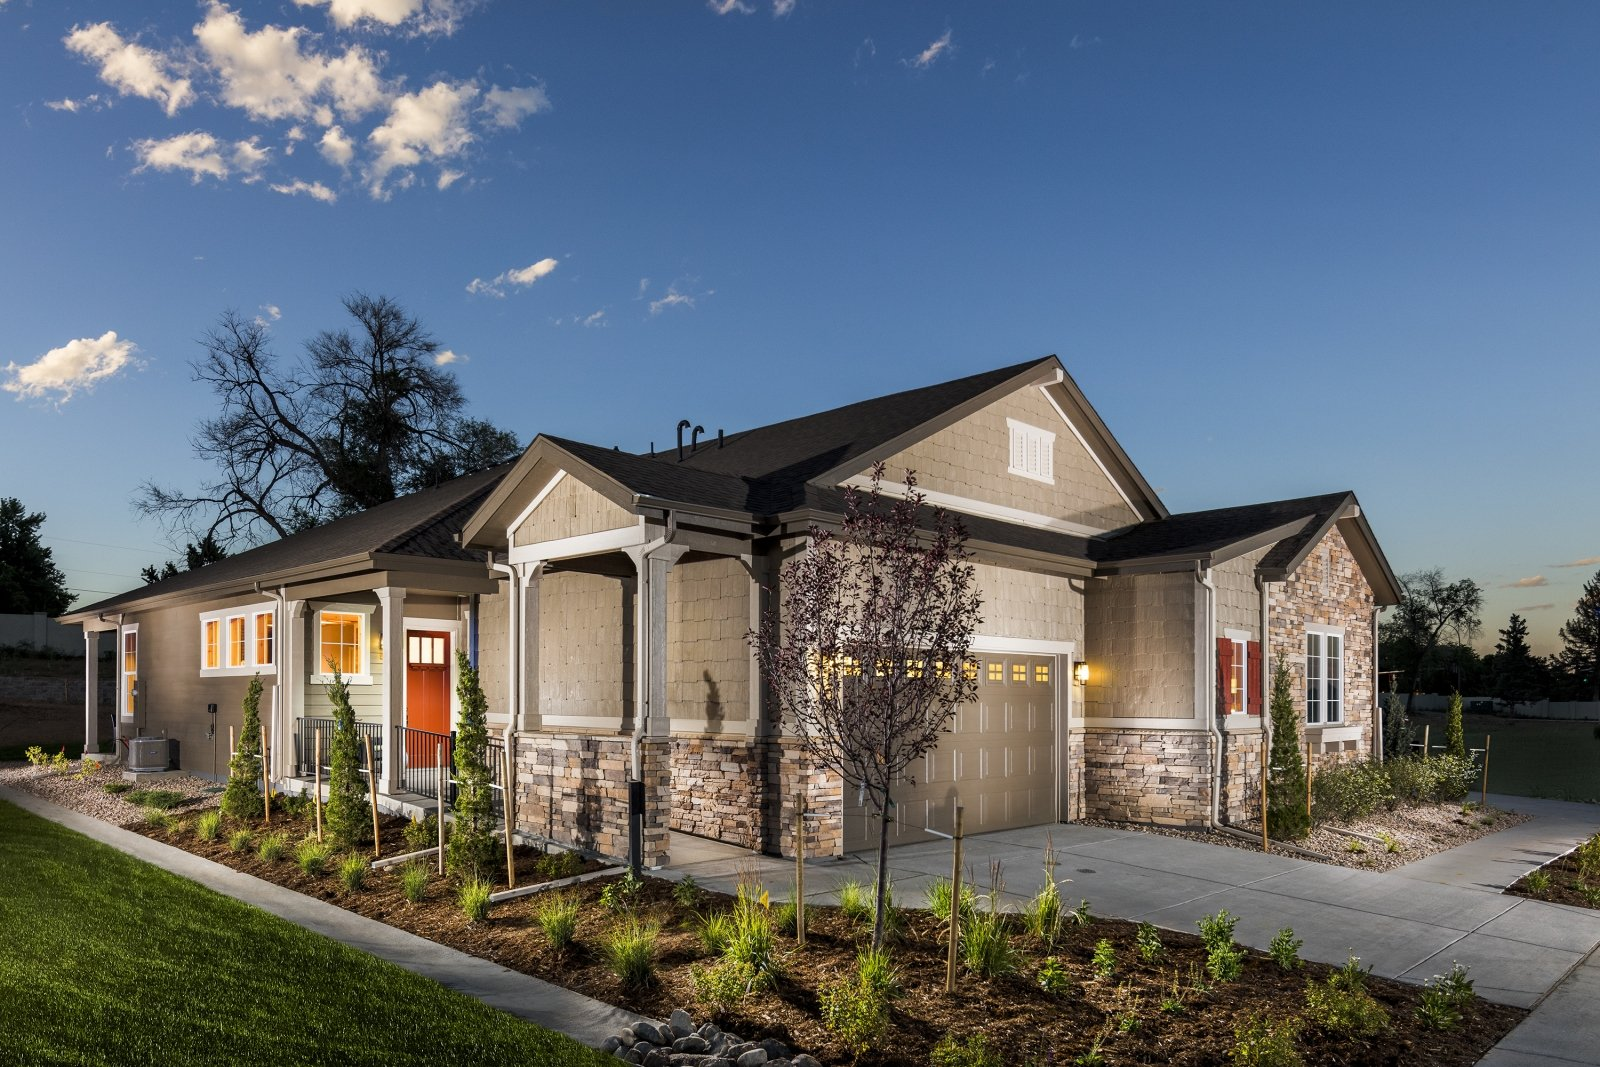 Designing For Life Age Becomes A Home Design Consideration Coloradobiz Magazine